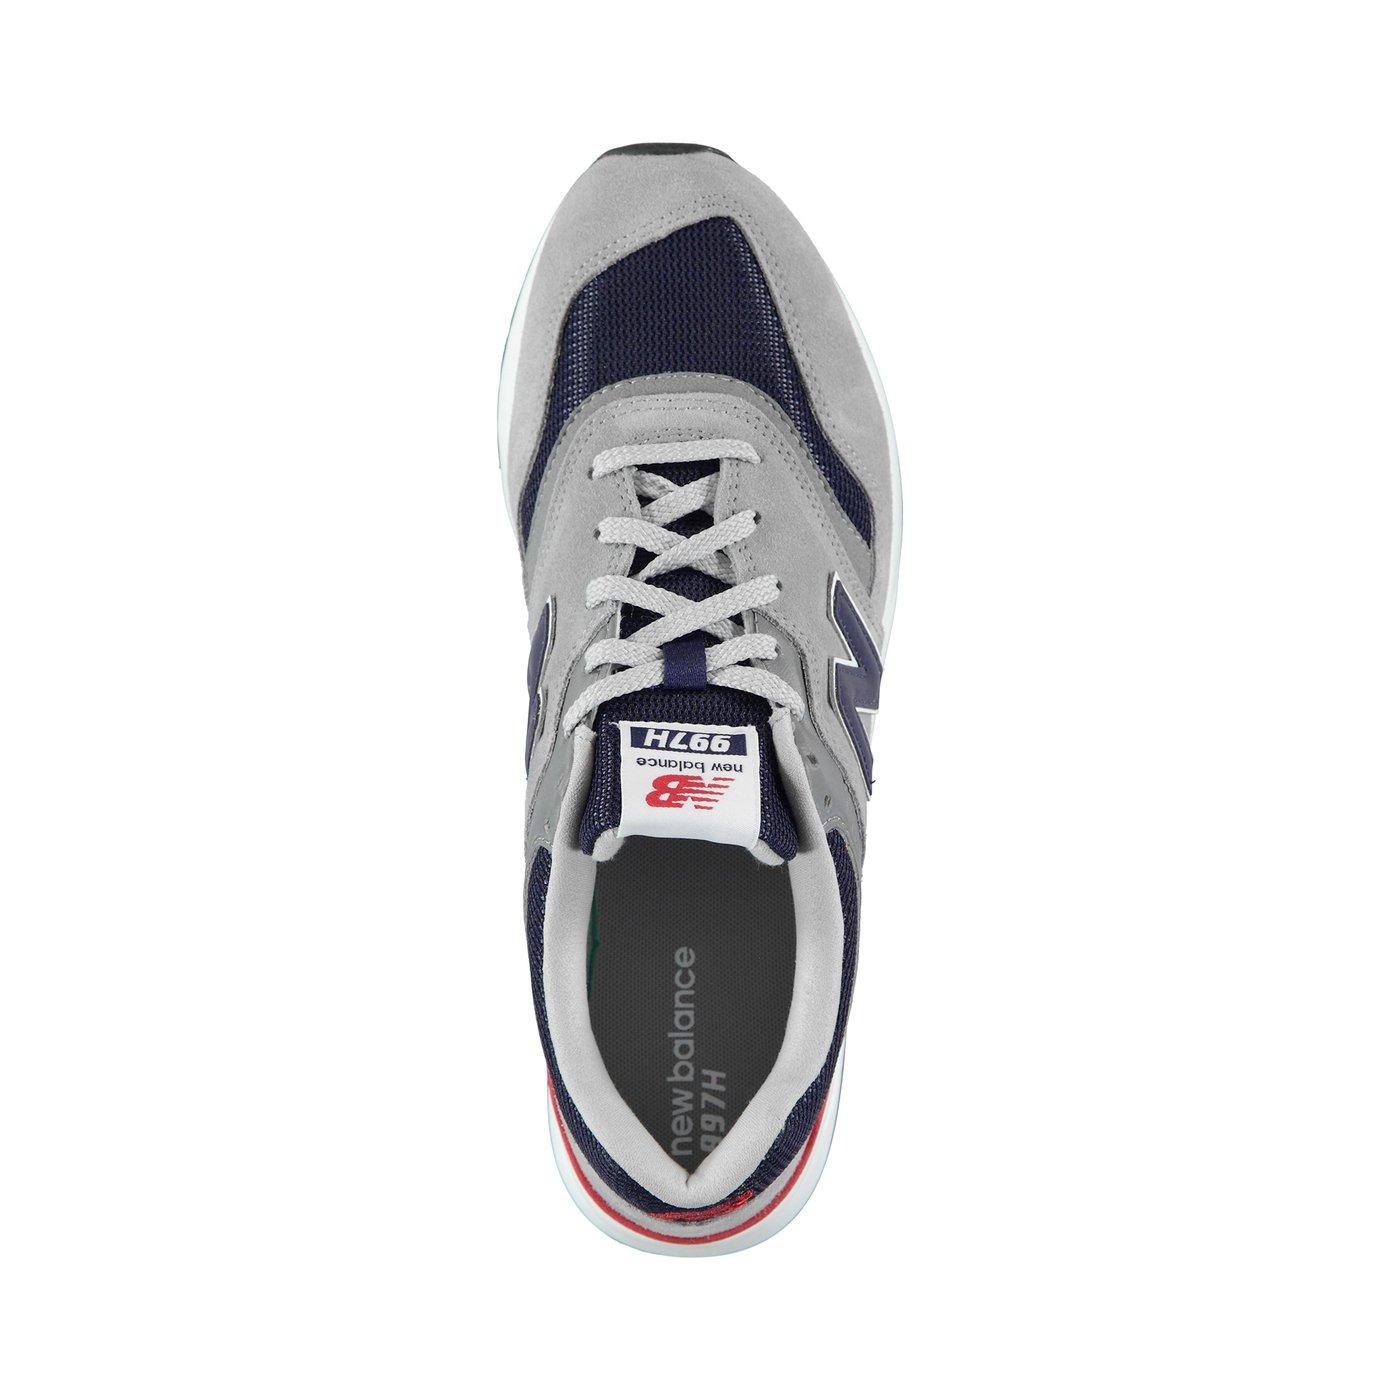 New Balance 997H Classic Pack Erkek Gri Spor Ayakkabı